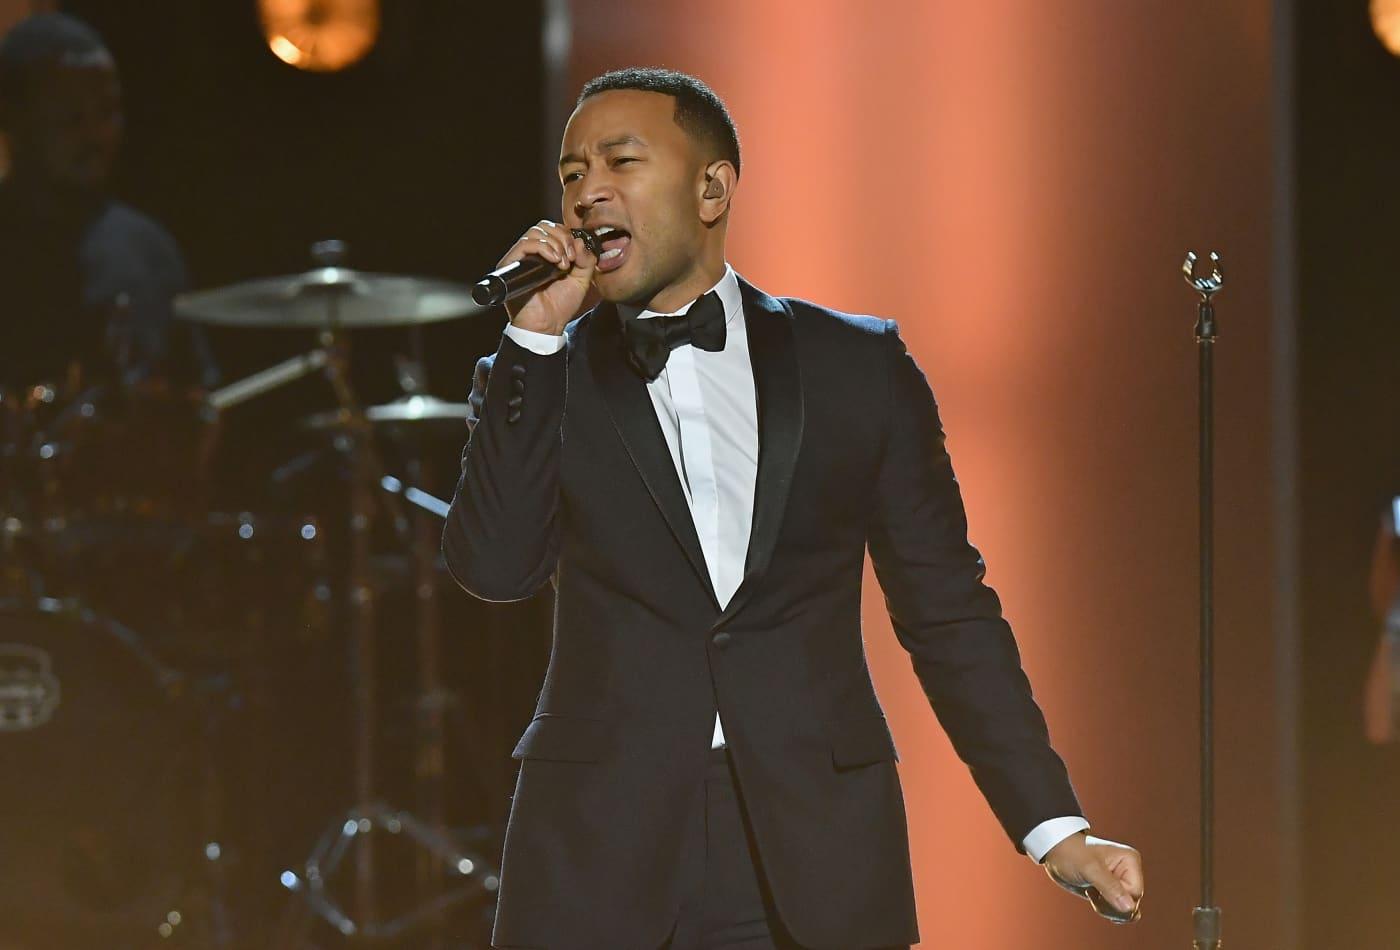 John Legend left a safe corporate job after college to